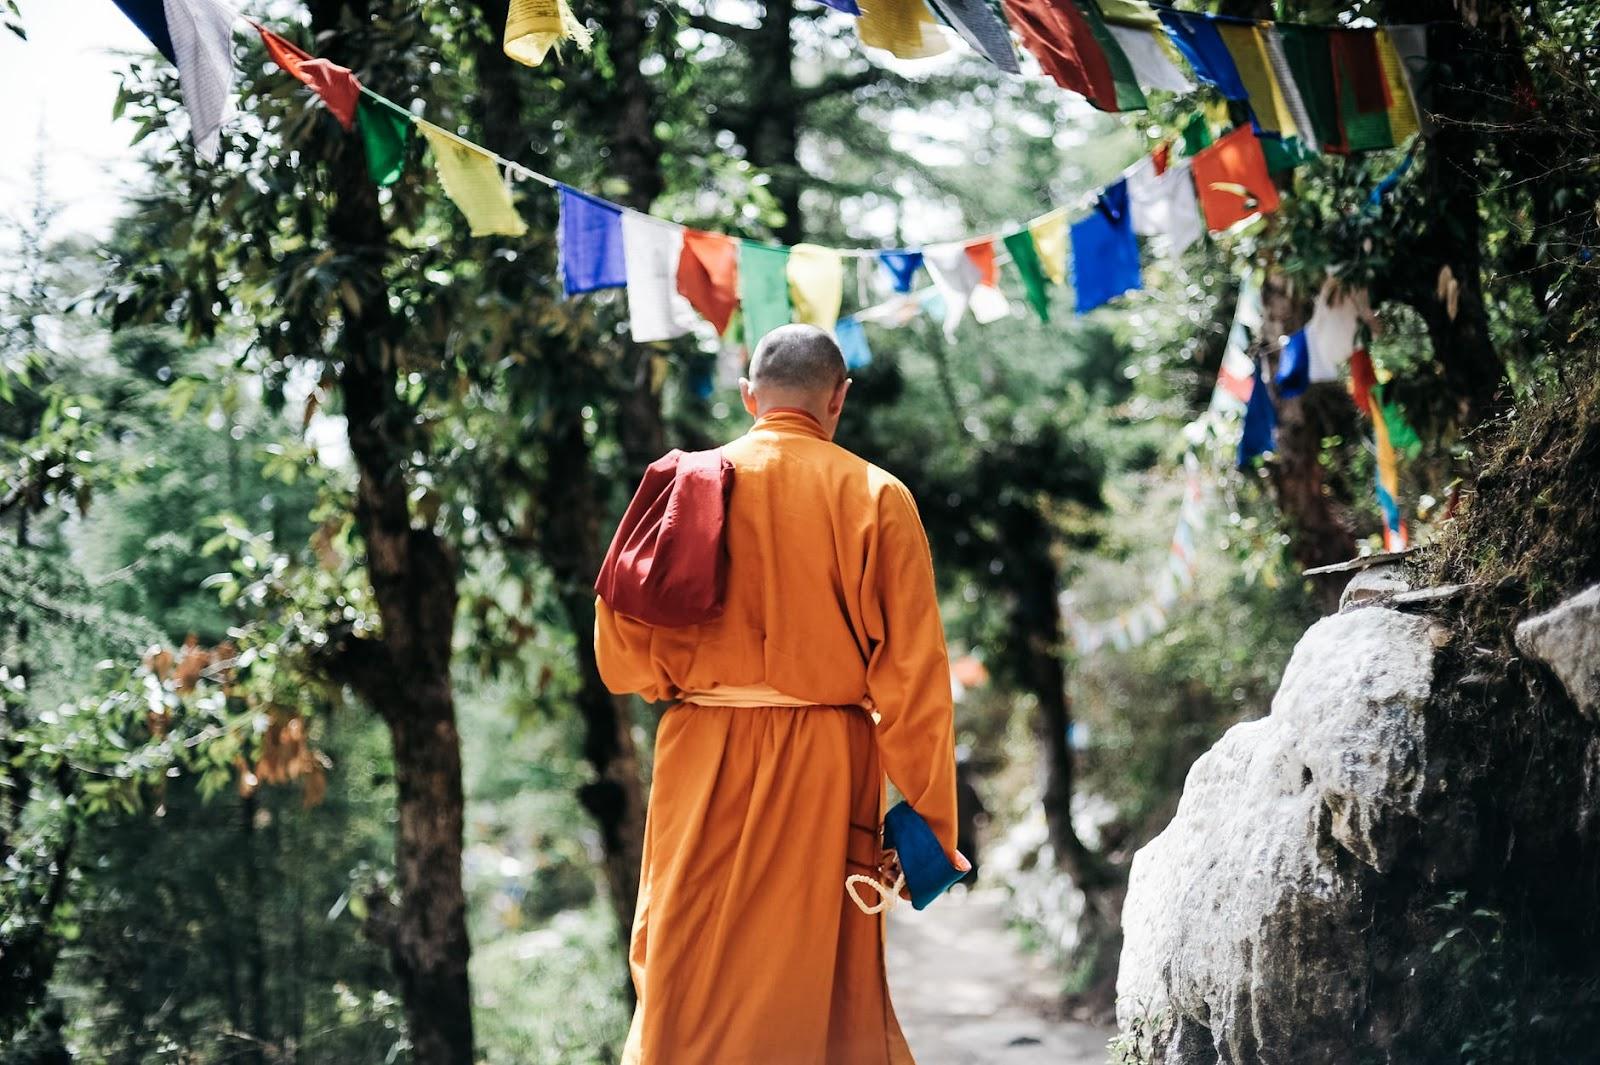 Buddhist monk walking away